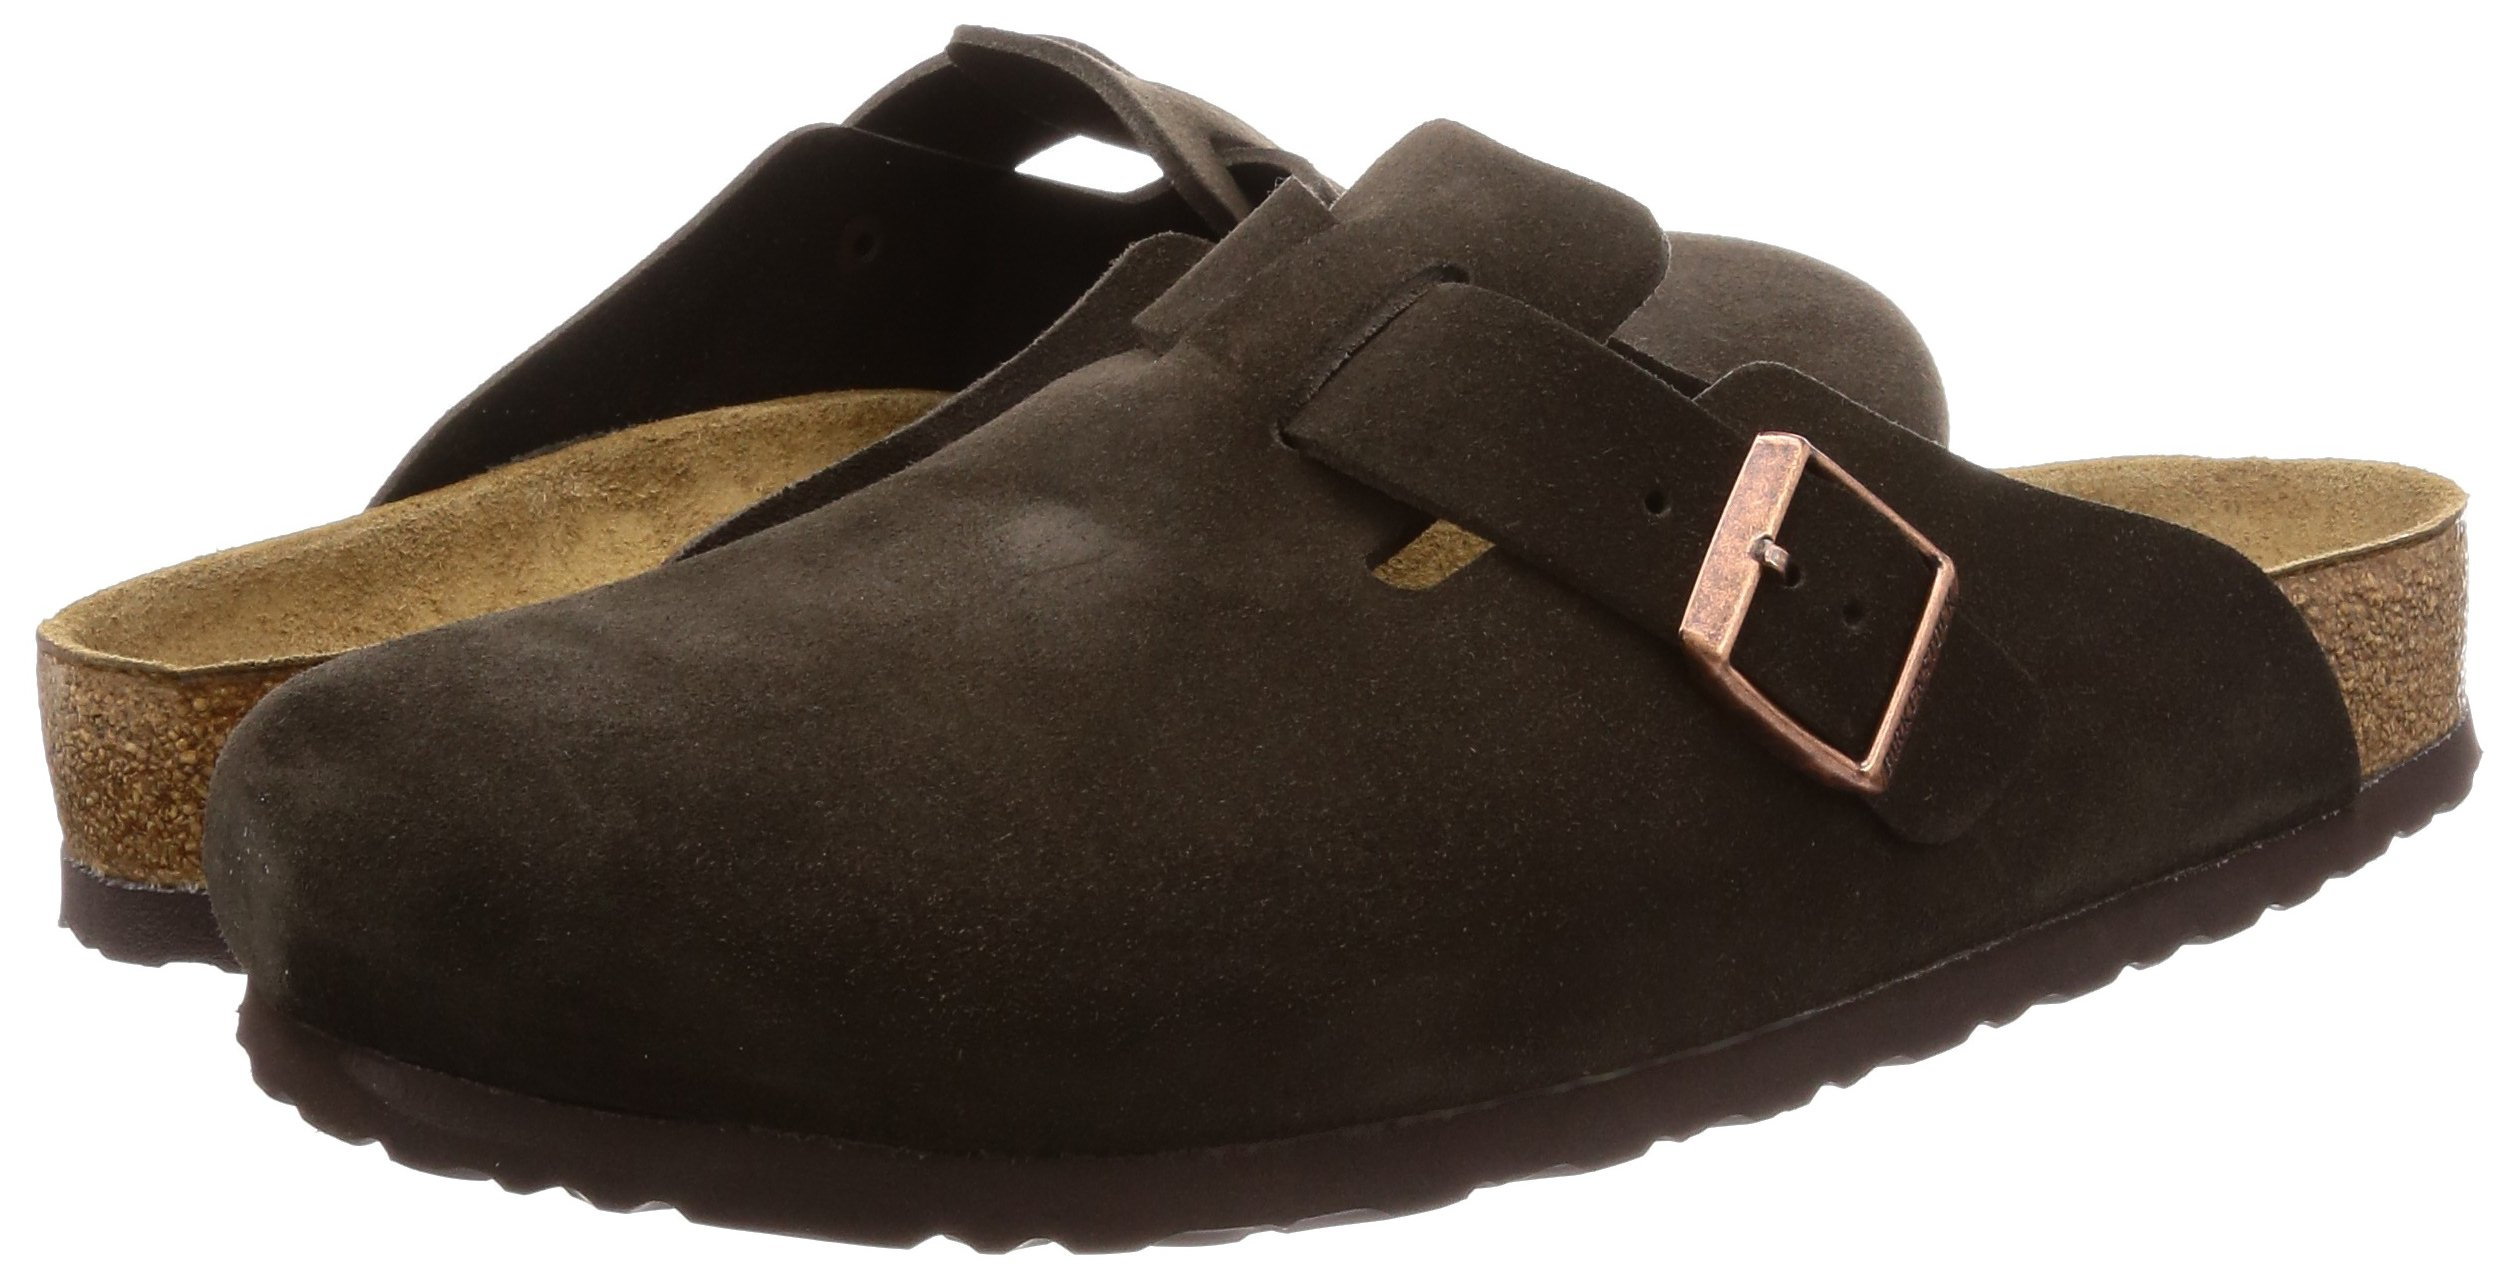 81afZutDY L - Arcopedico Womens LS 1151 Fabric Shoes